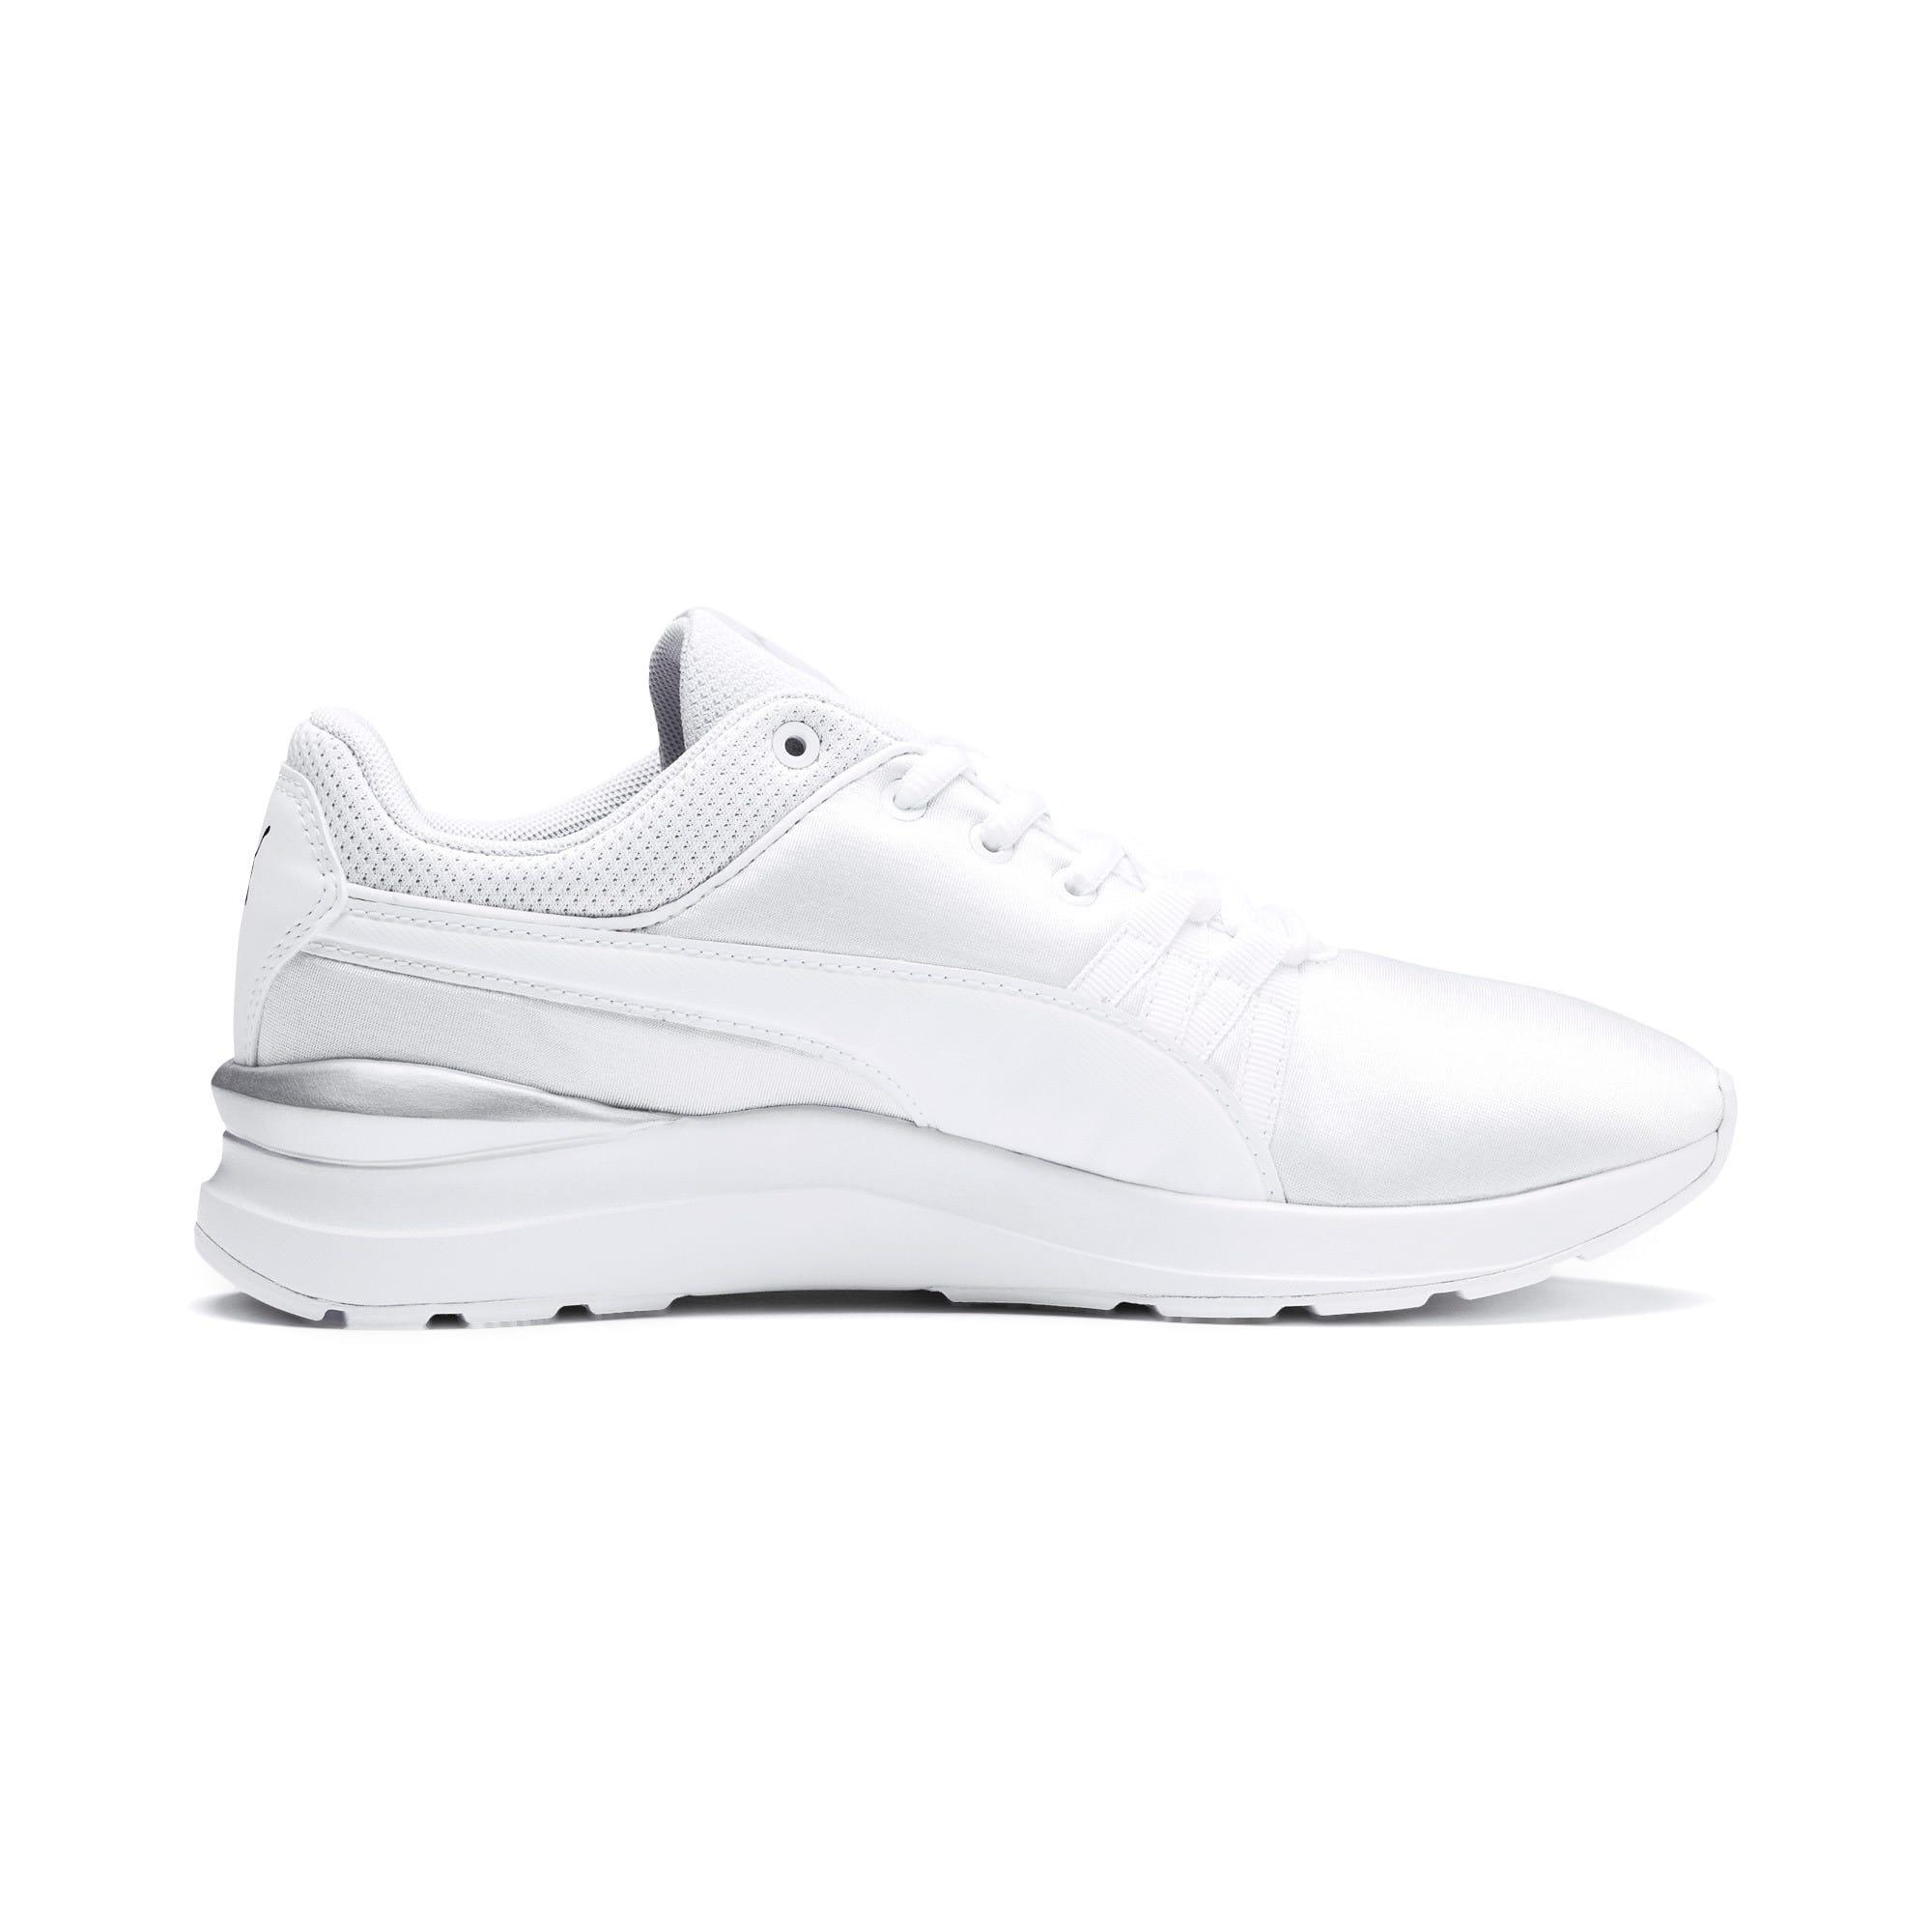 Thumbnail 5 of Adela Women's Sneakers, Puma White-Puma White, medium